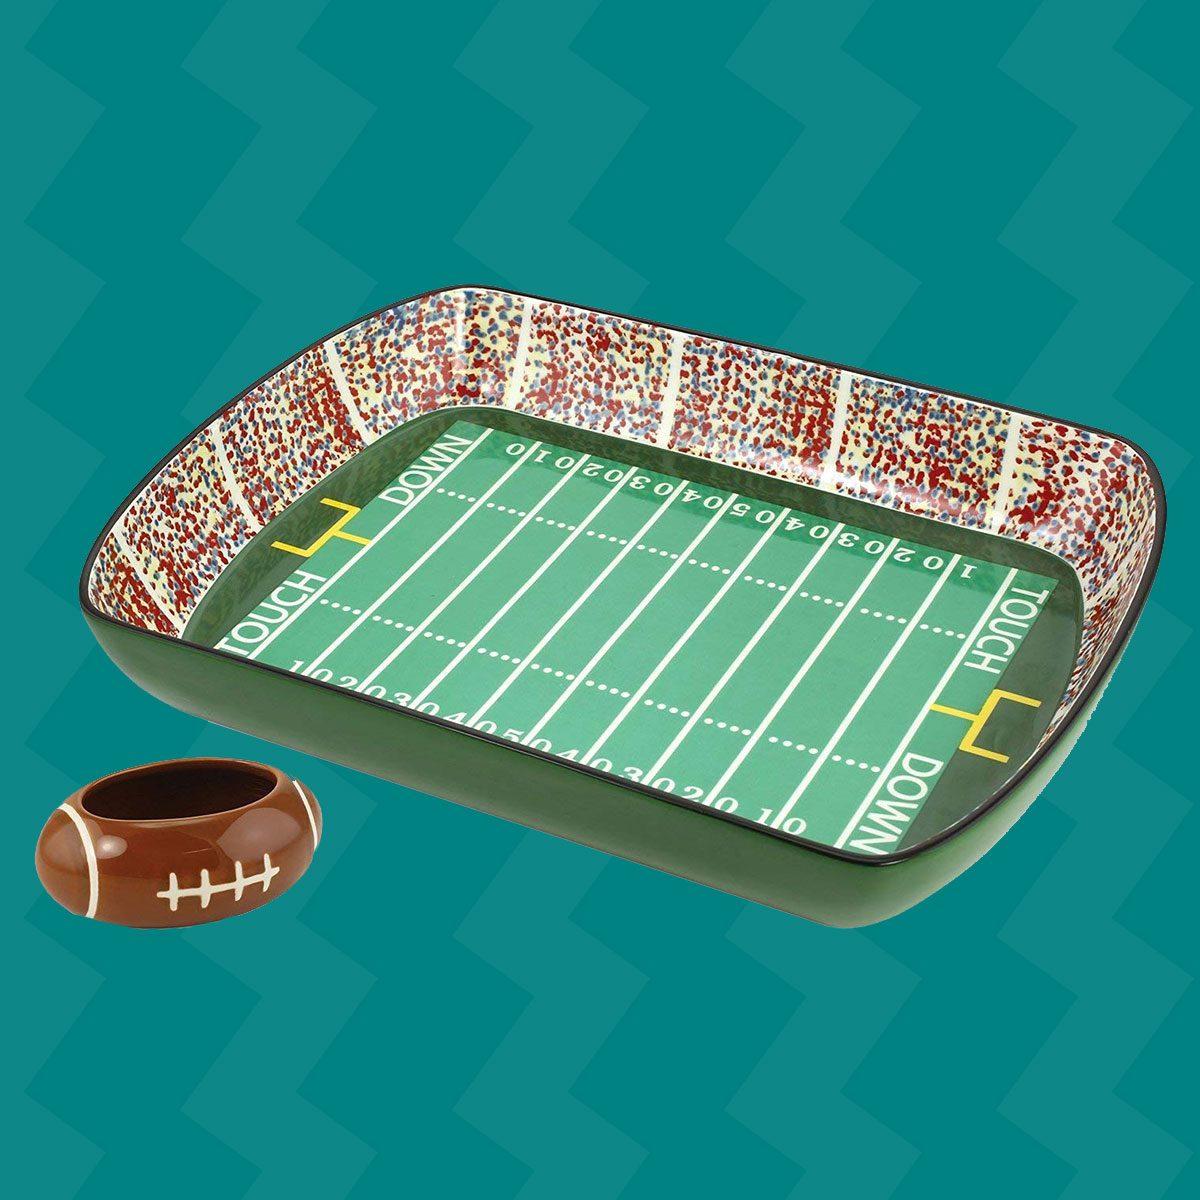 KOVOT Football Stadium Game Day Ceramic Chip and Dip Dish, Green